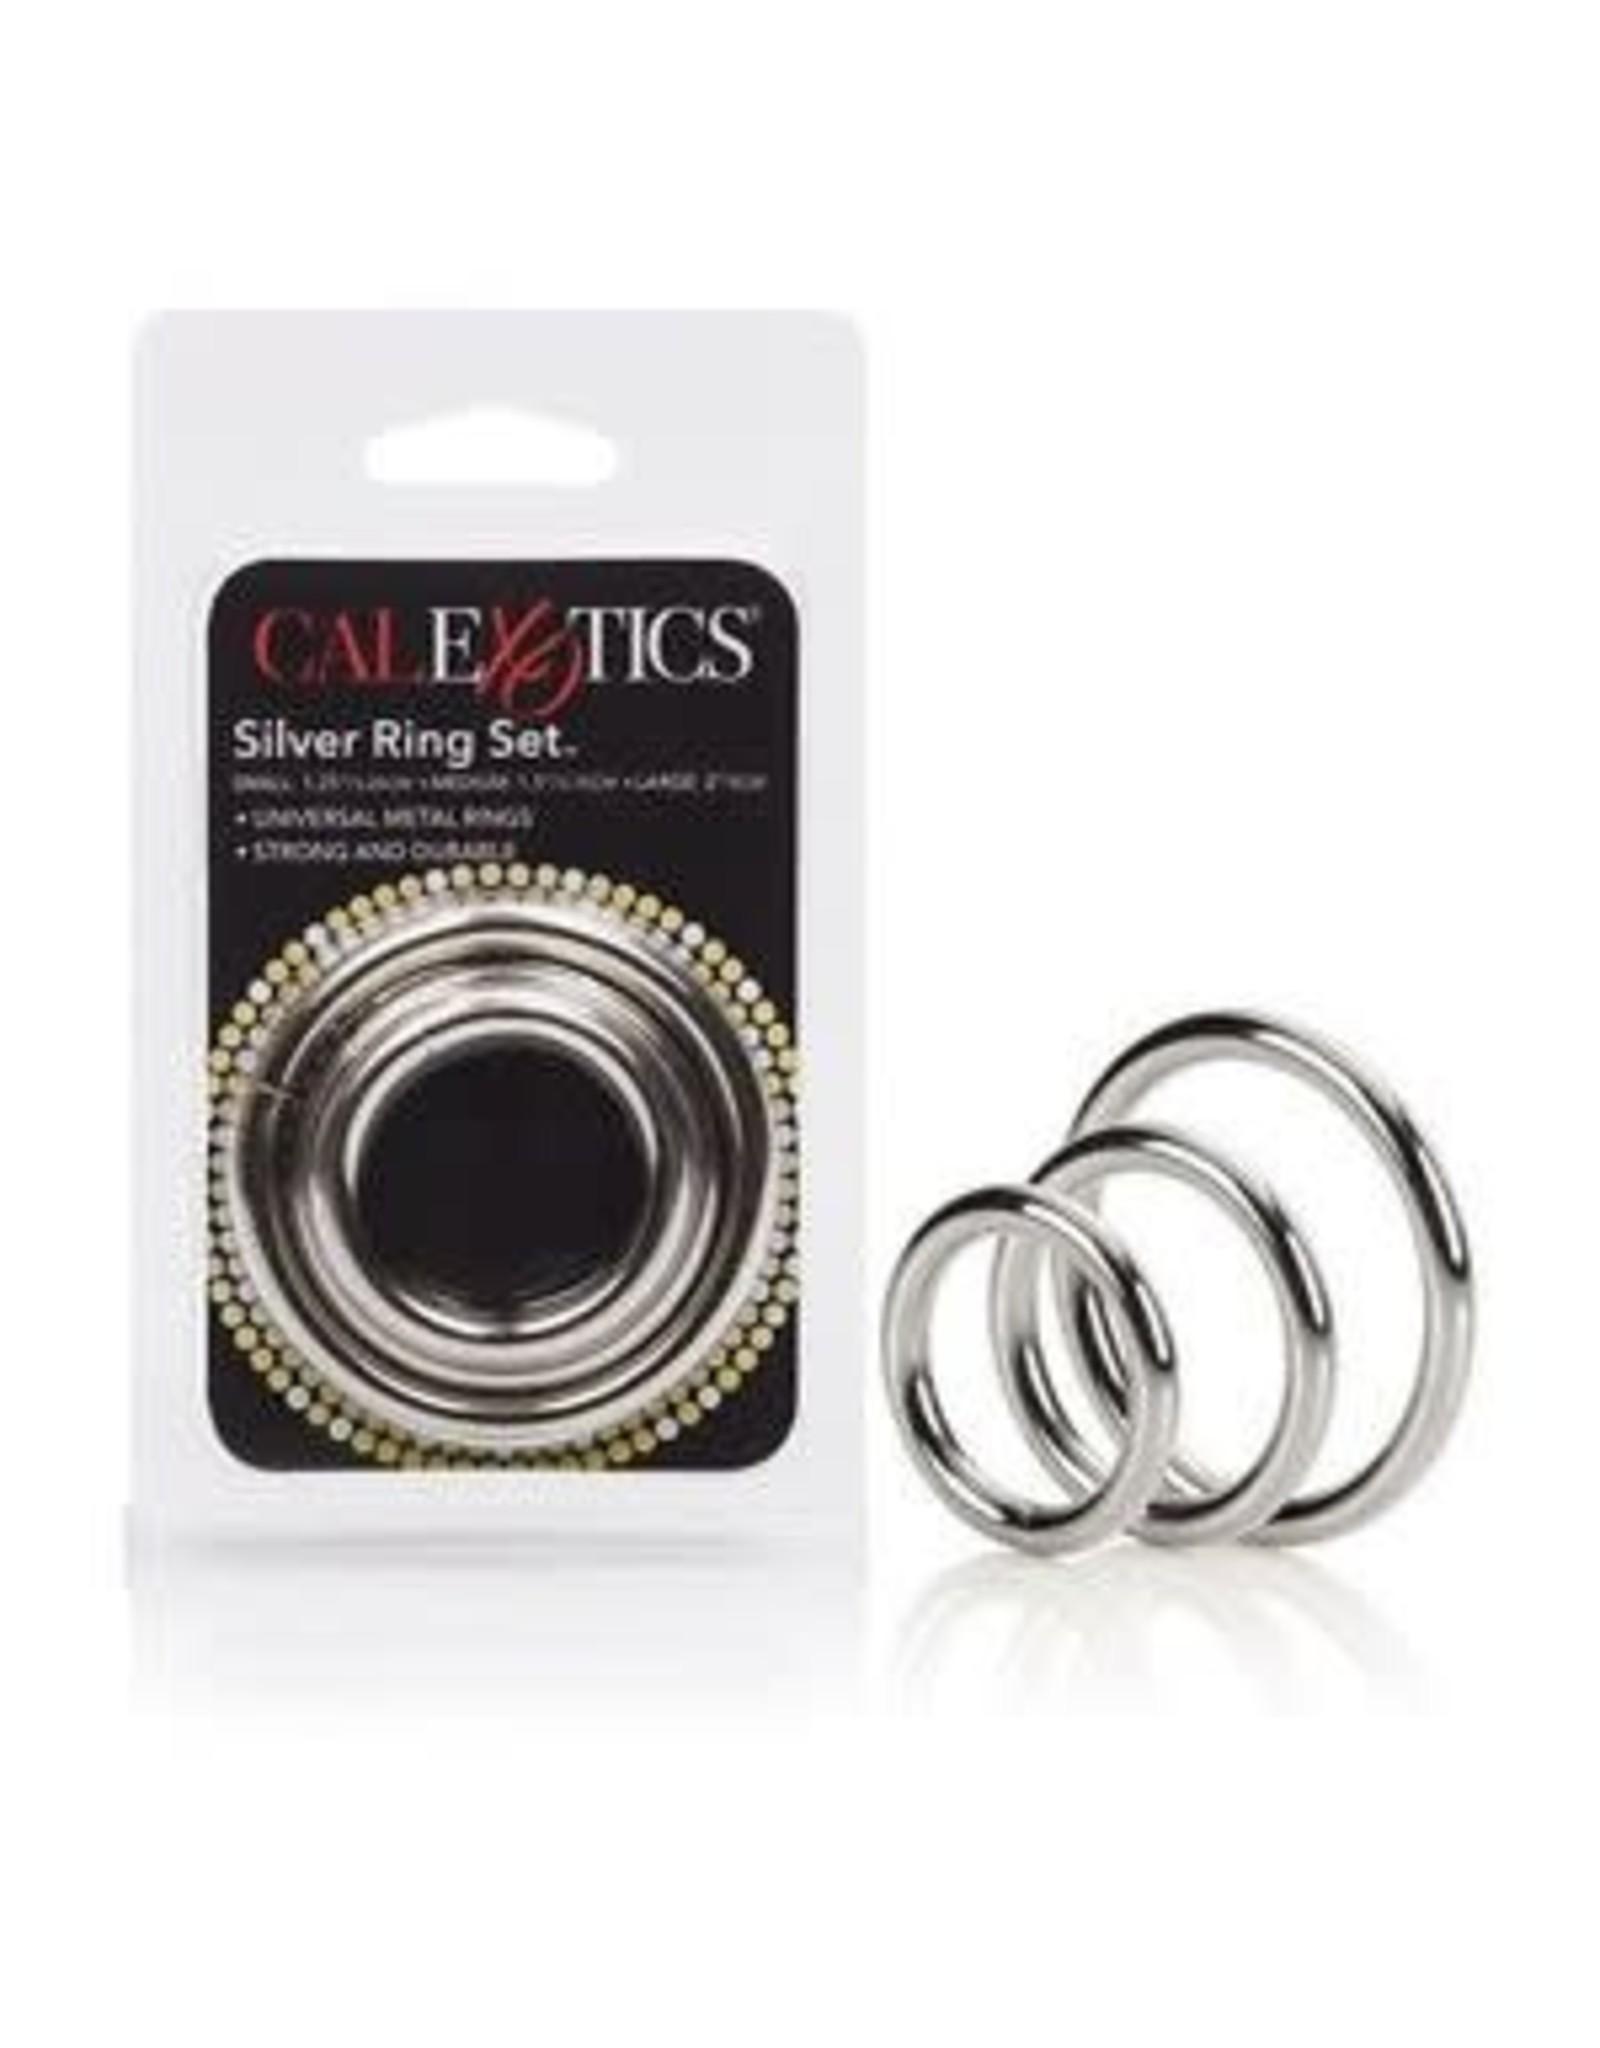 CALEXOTICS CALEXOTICS - SILVER RING SET - 3 PIECE